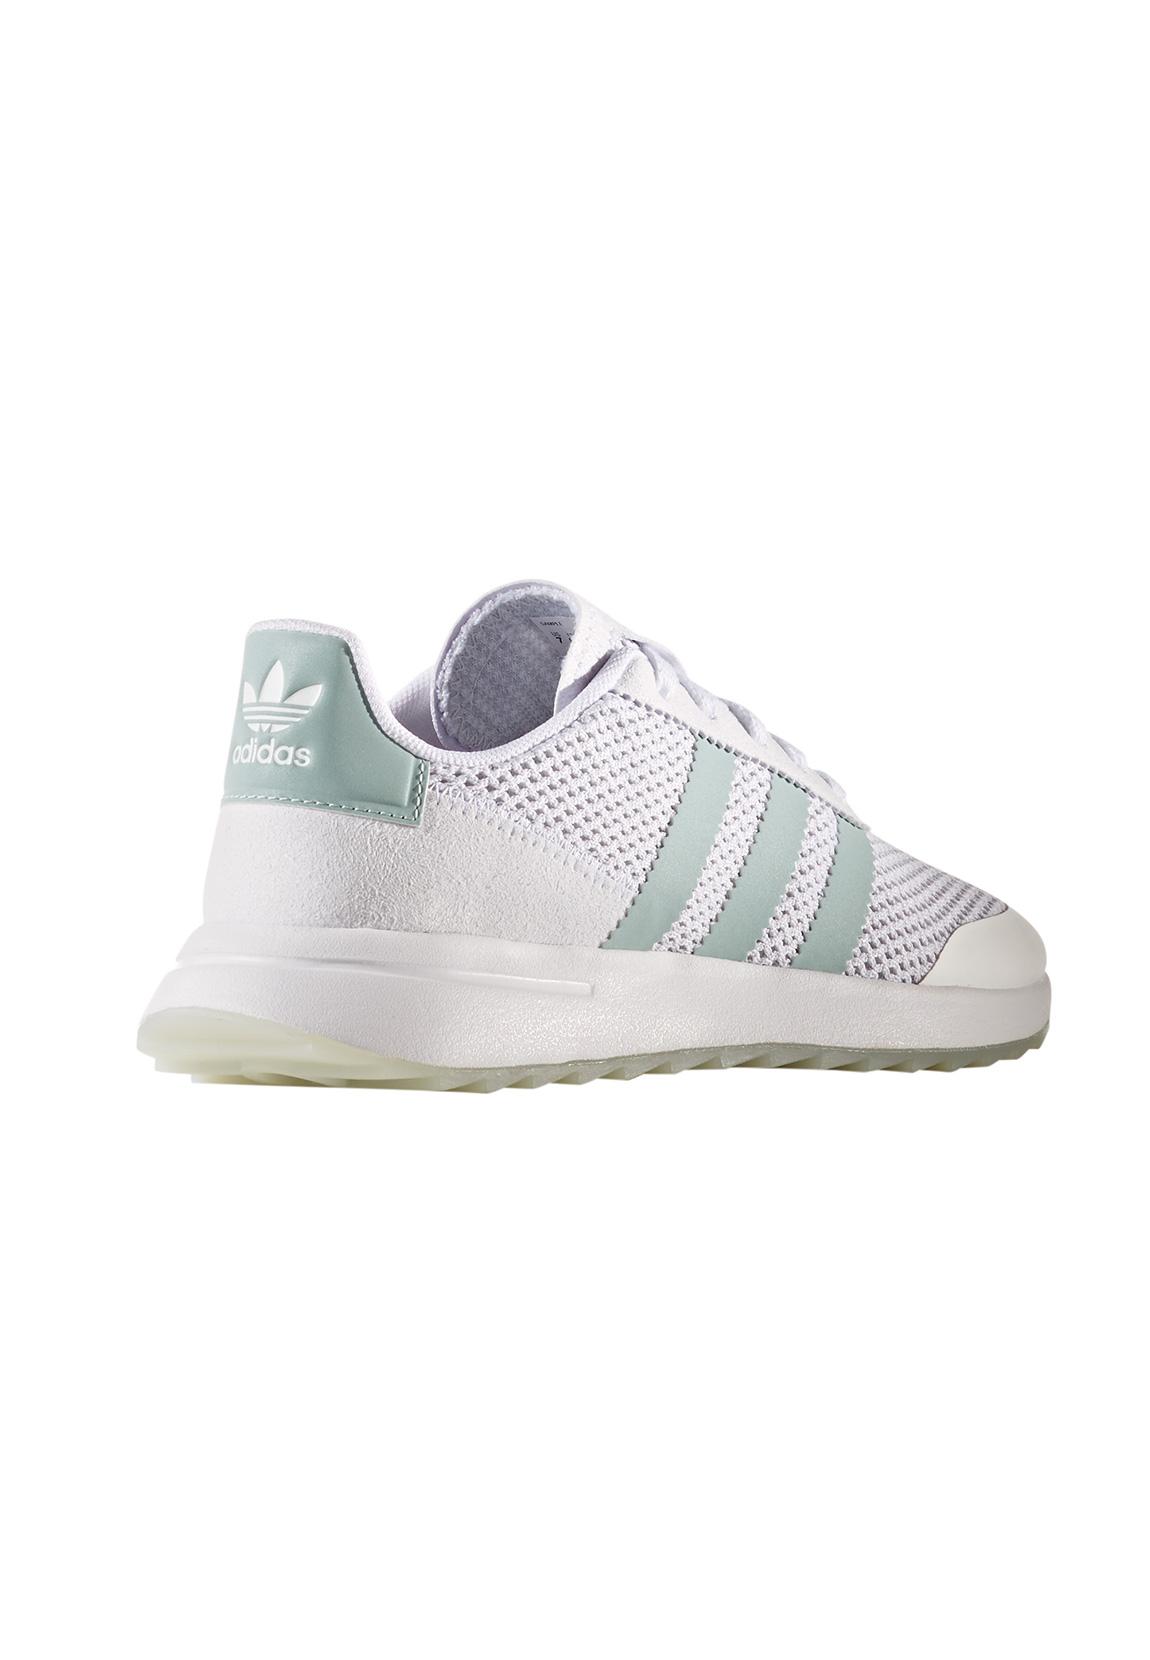 new concept b7f38 14d56 Adidas Damen Sneaker FLB W BY9685 Weiß Türkis